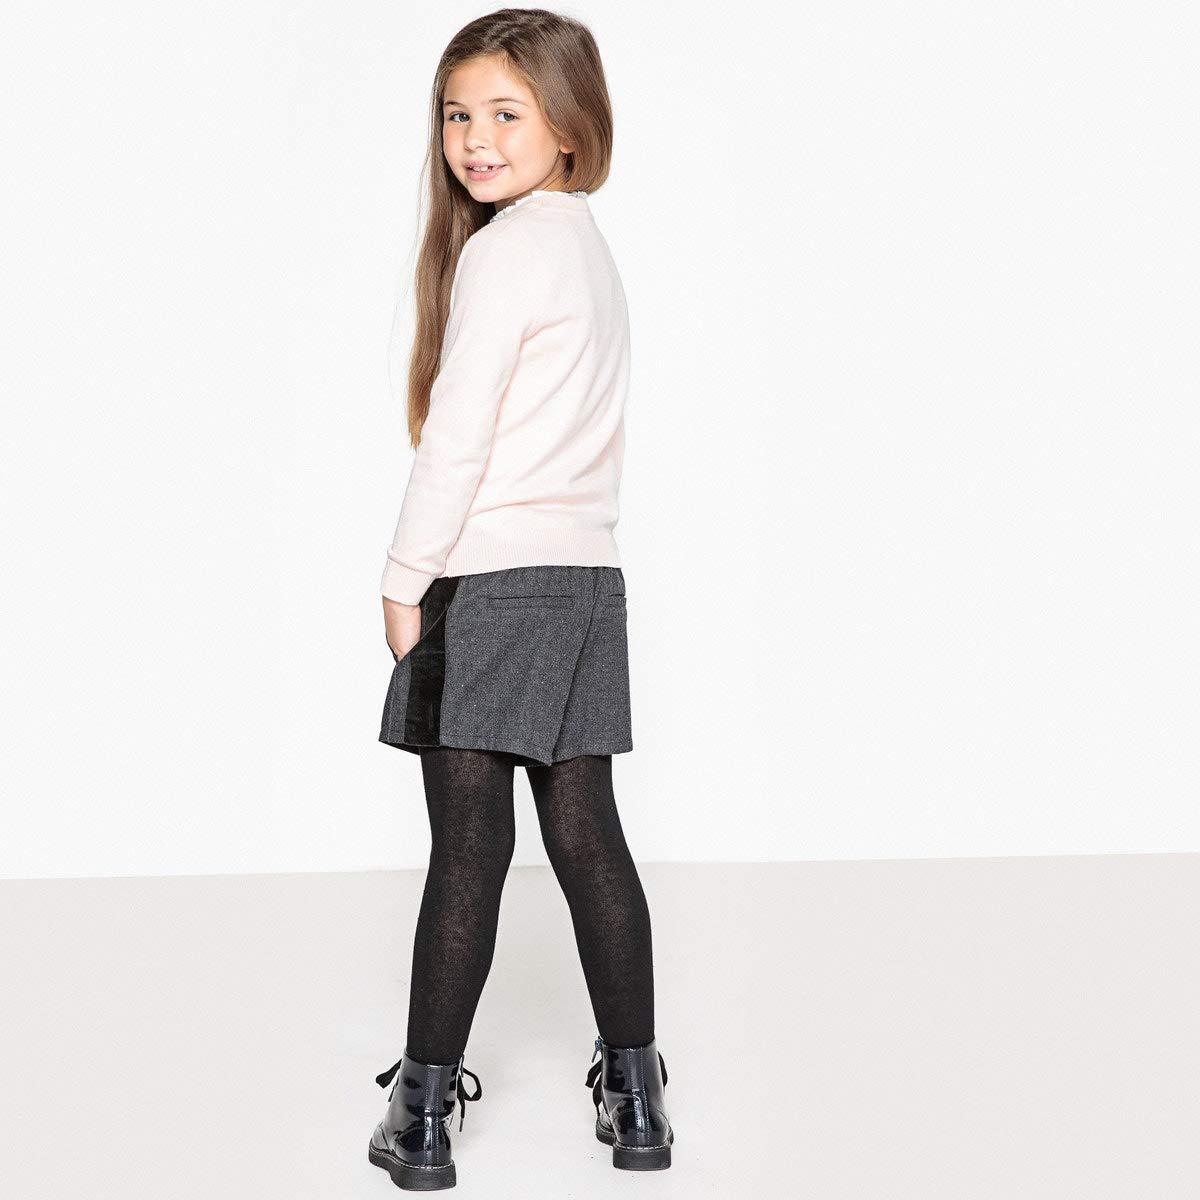 Uniross Fox Print Fine Knit Jumper//Sweater 3-12 Years